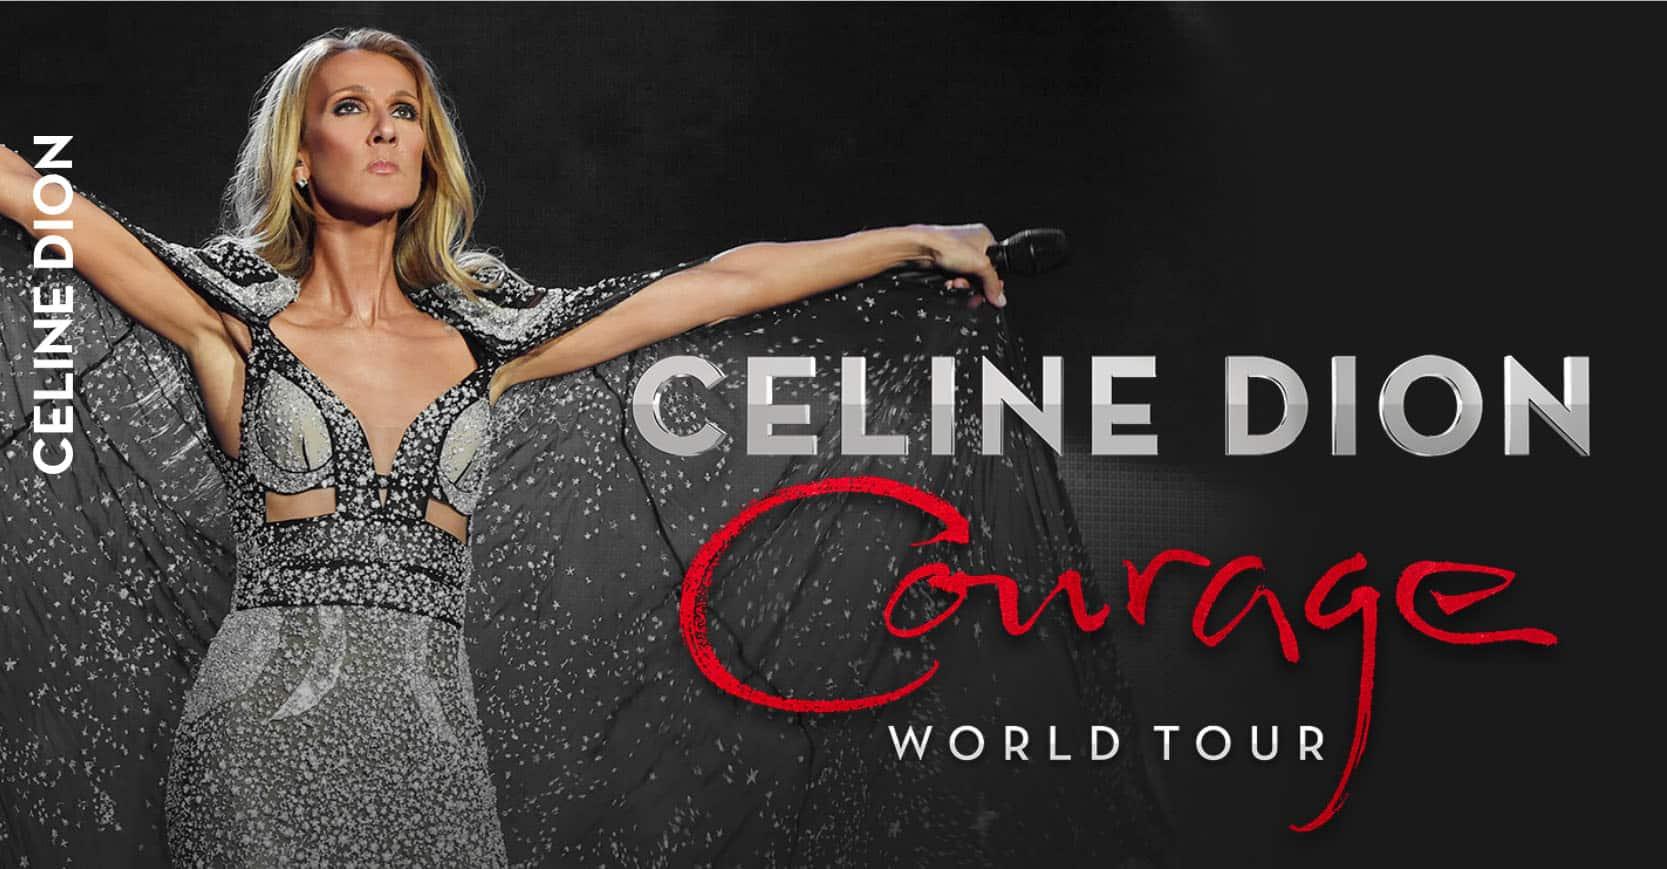 Celine Dion setlist